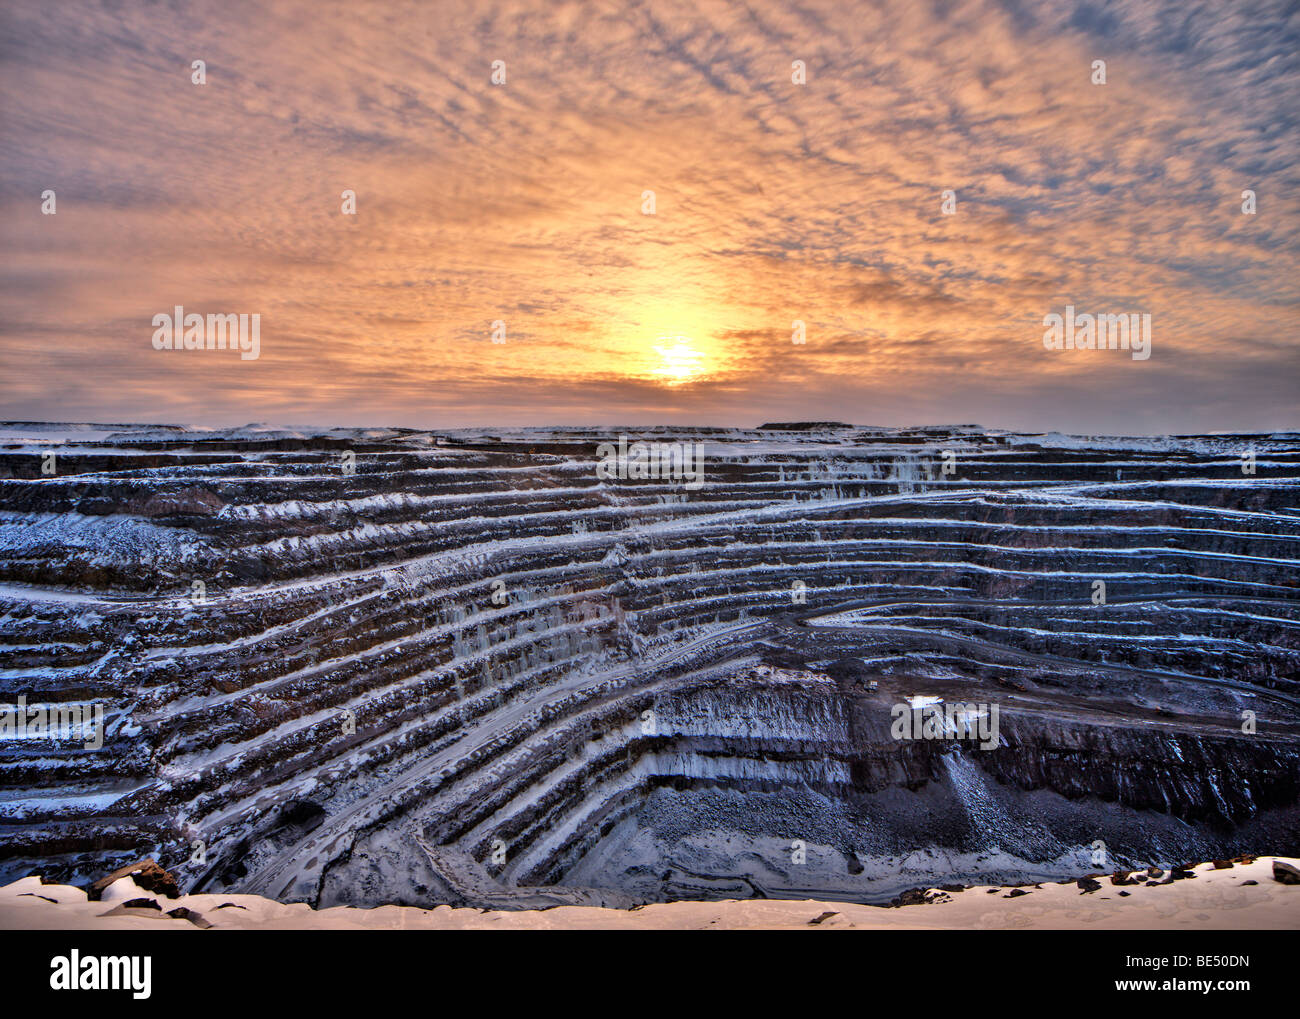 Ore mine in Gaellivare, Sweden, Scandinavia, Europe - Stock Image